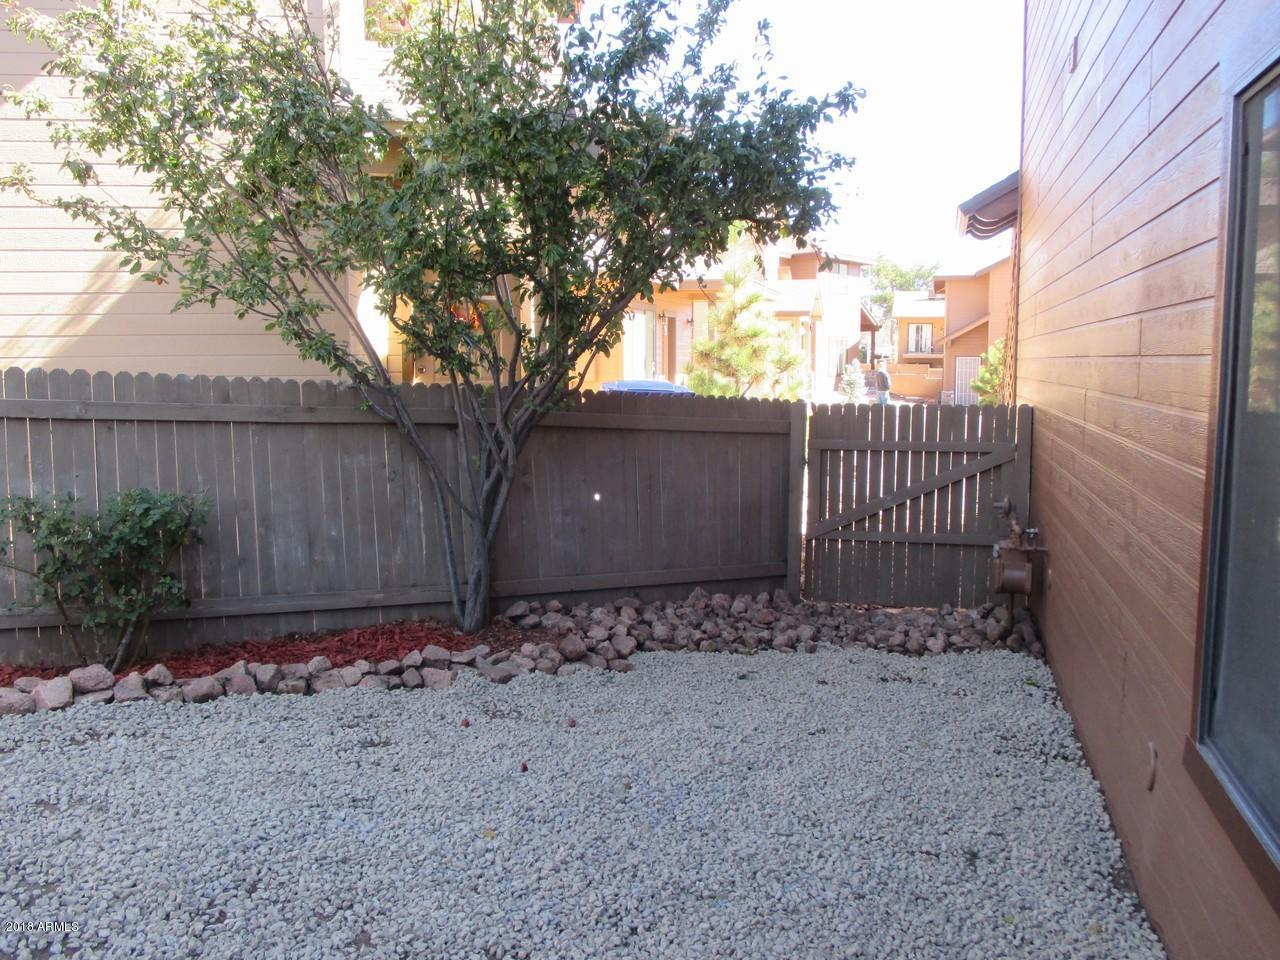 MLS 5841369 308 W Frontier Street, Payson, AZ Payson AZ Condo or Townhome